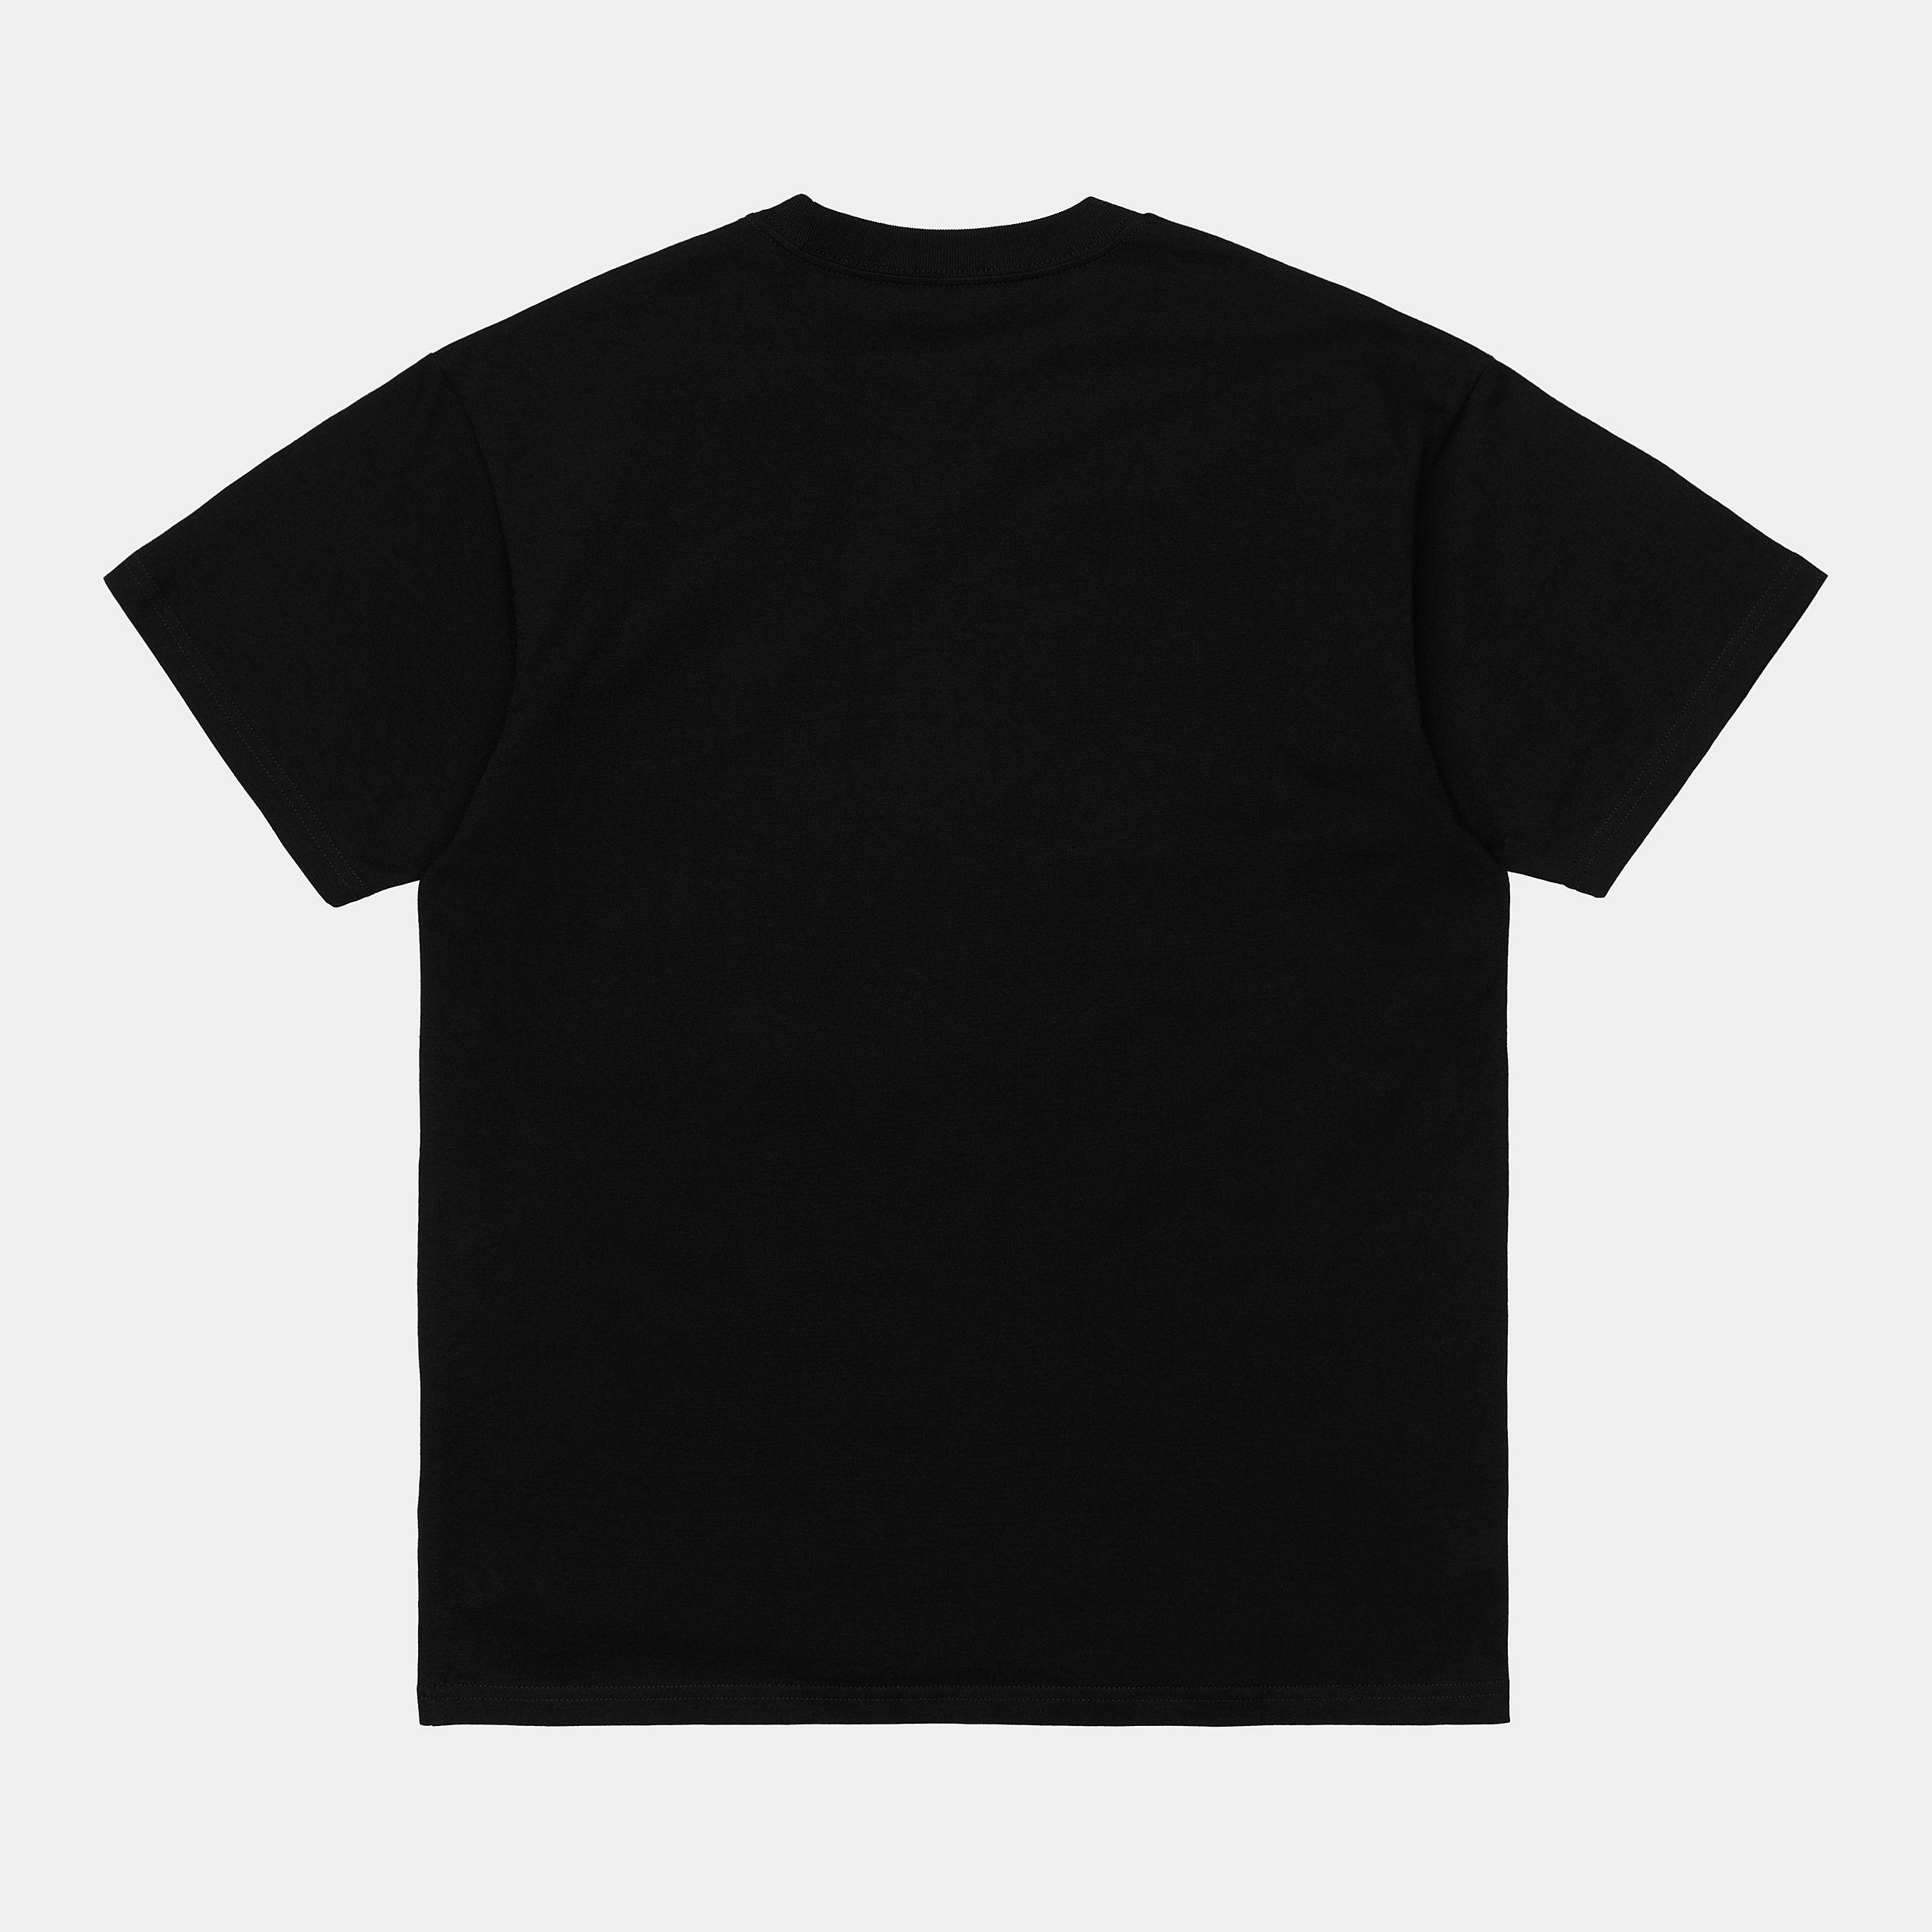 Carhartt motion script t-shirt CARHARTT | T-shirts | I02901389.00